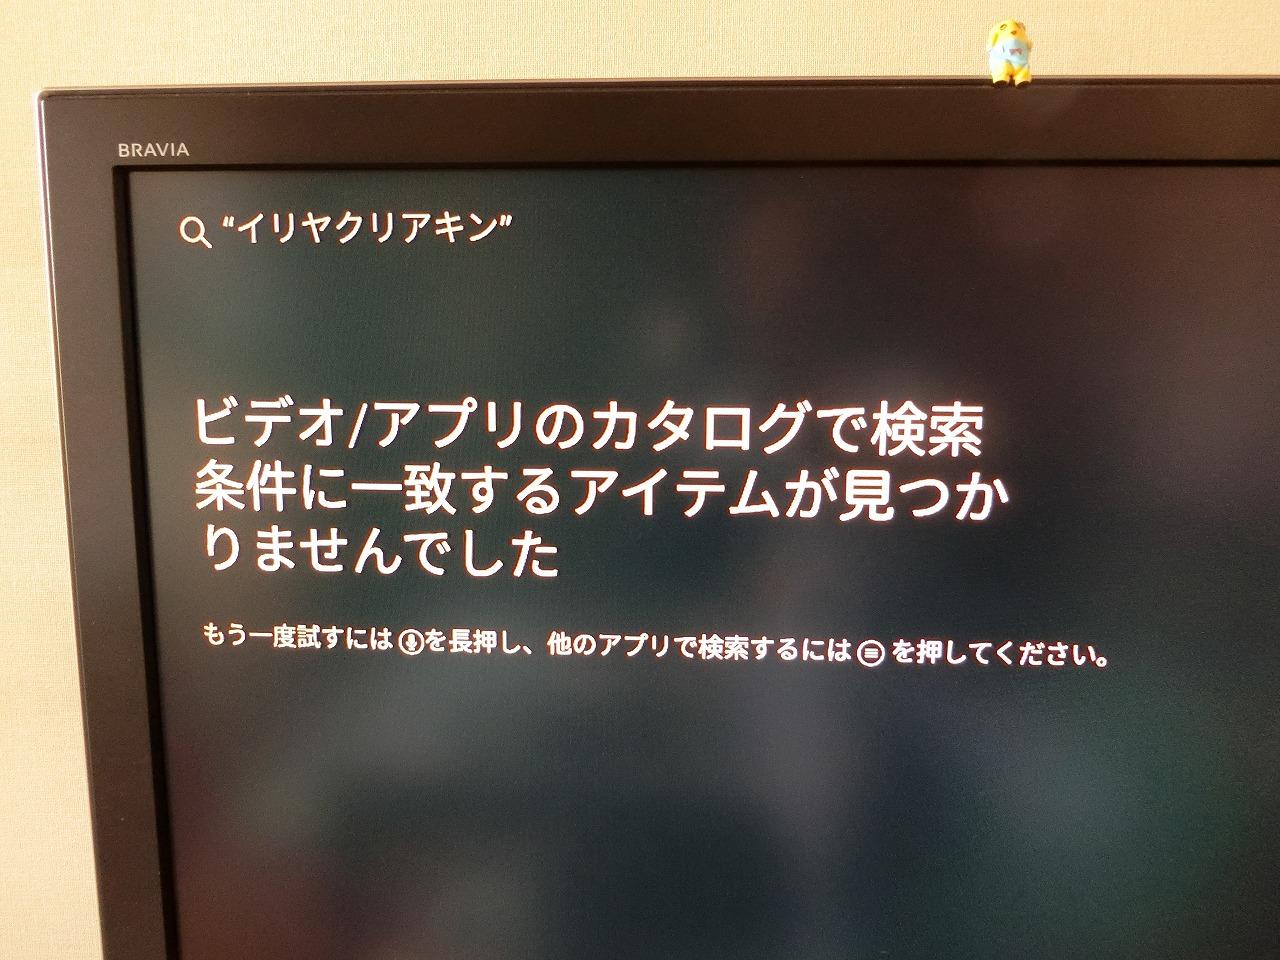 Fire_tv_stick_7s